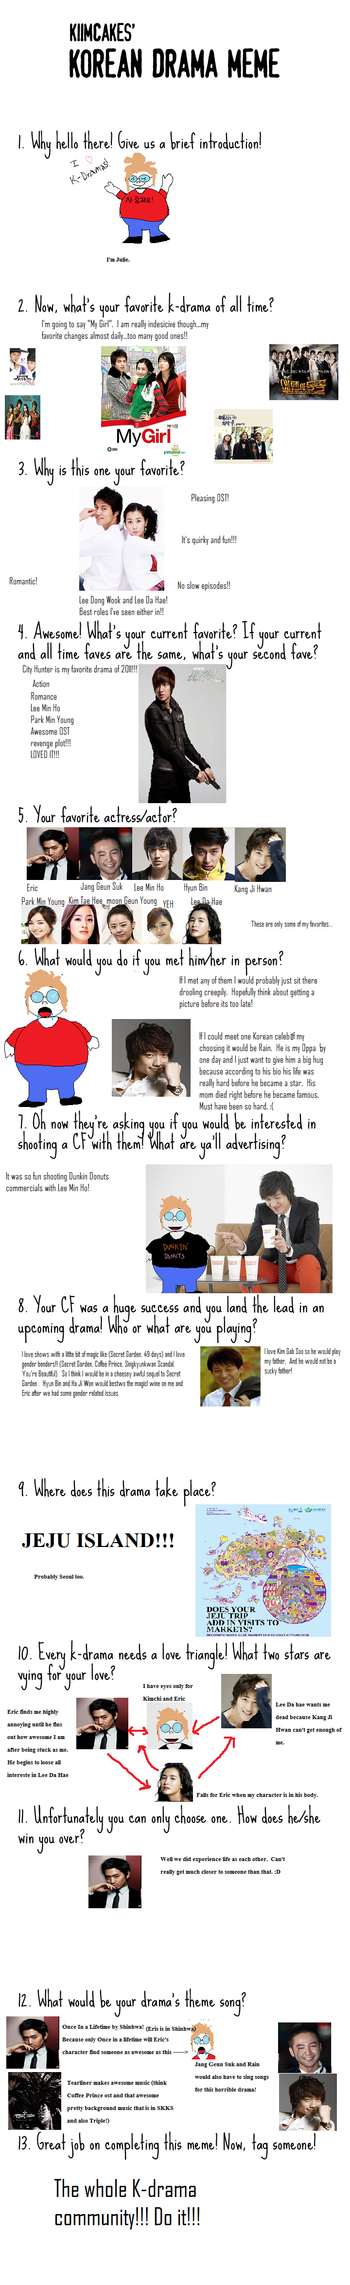 Korean Drama meme by Chilli74 on DeviantArt